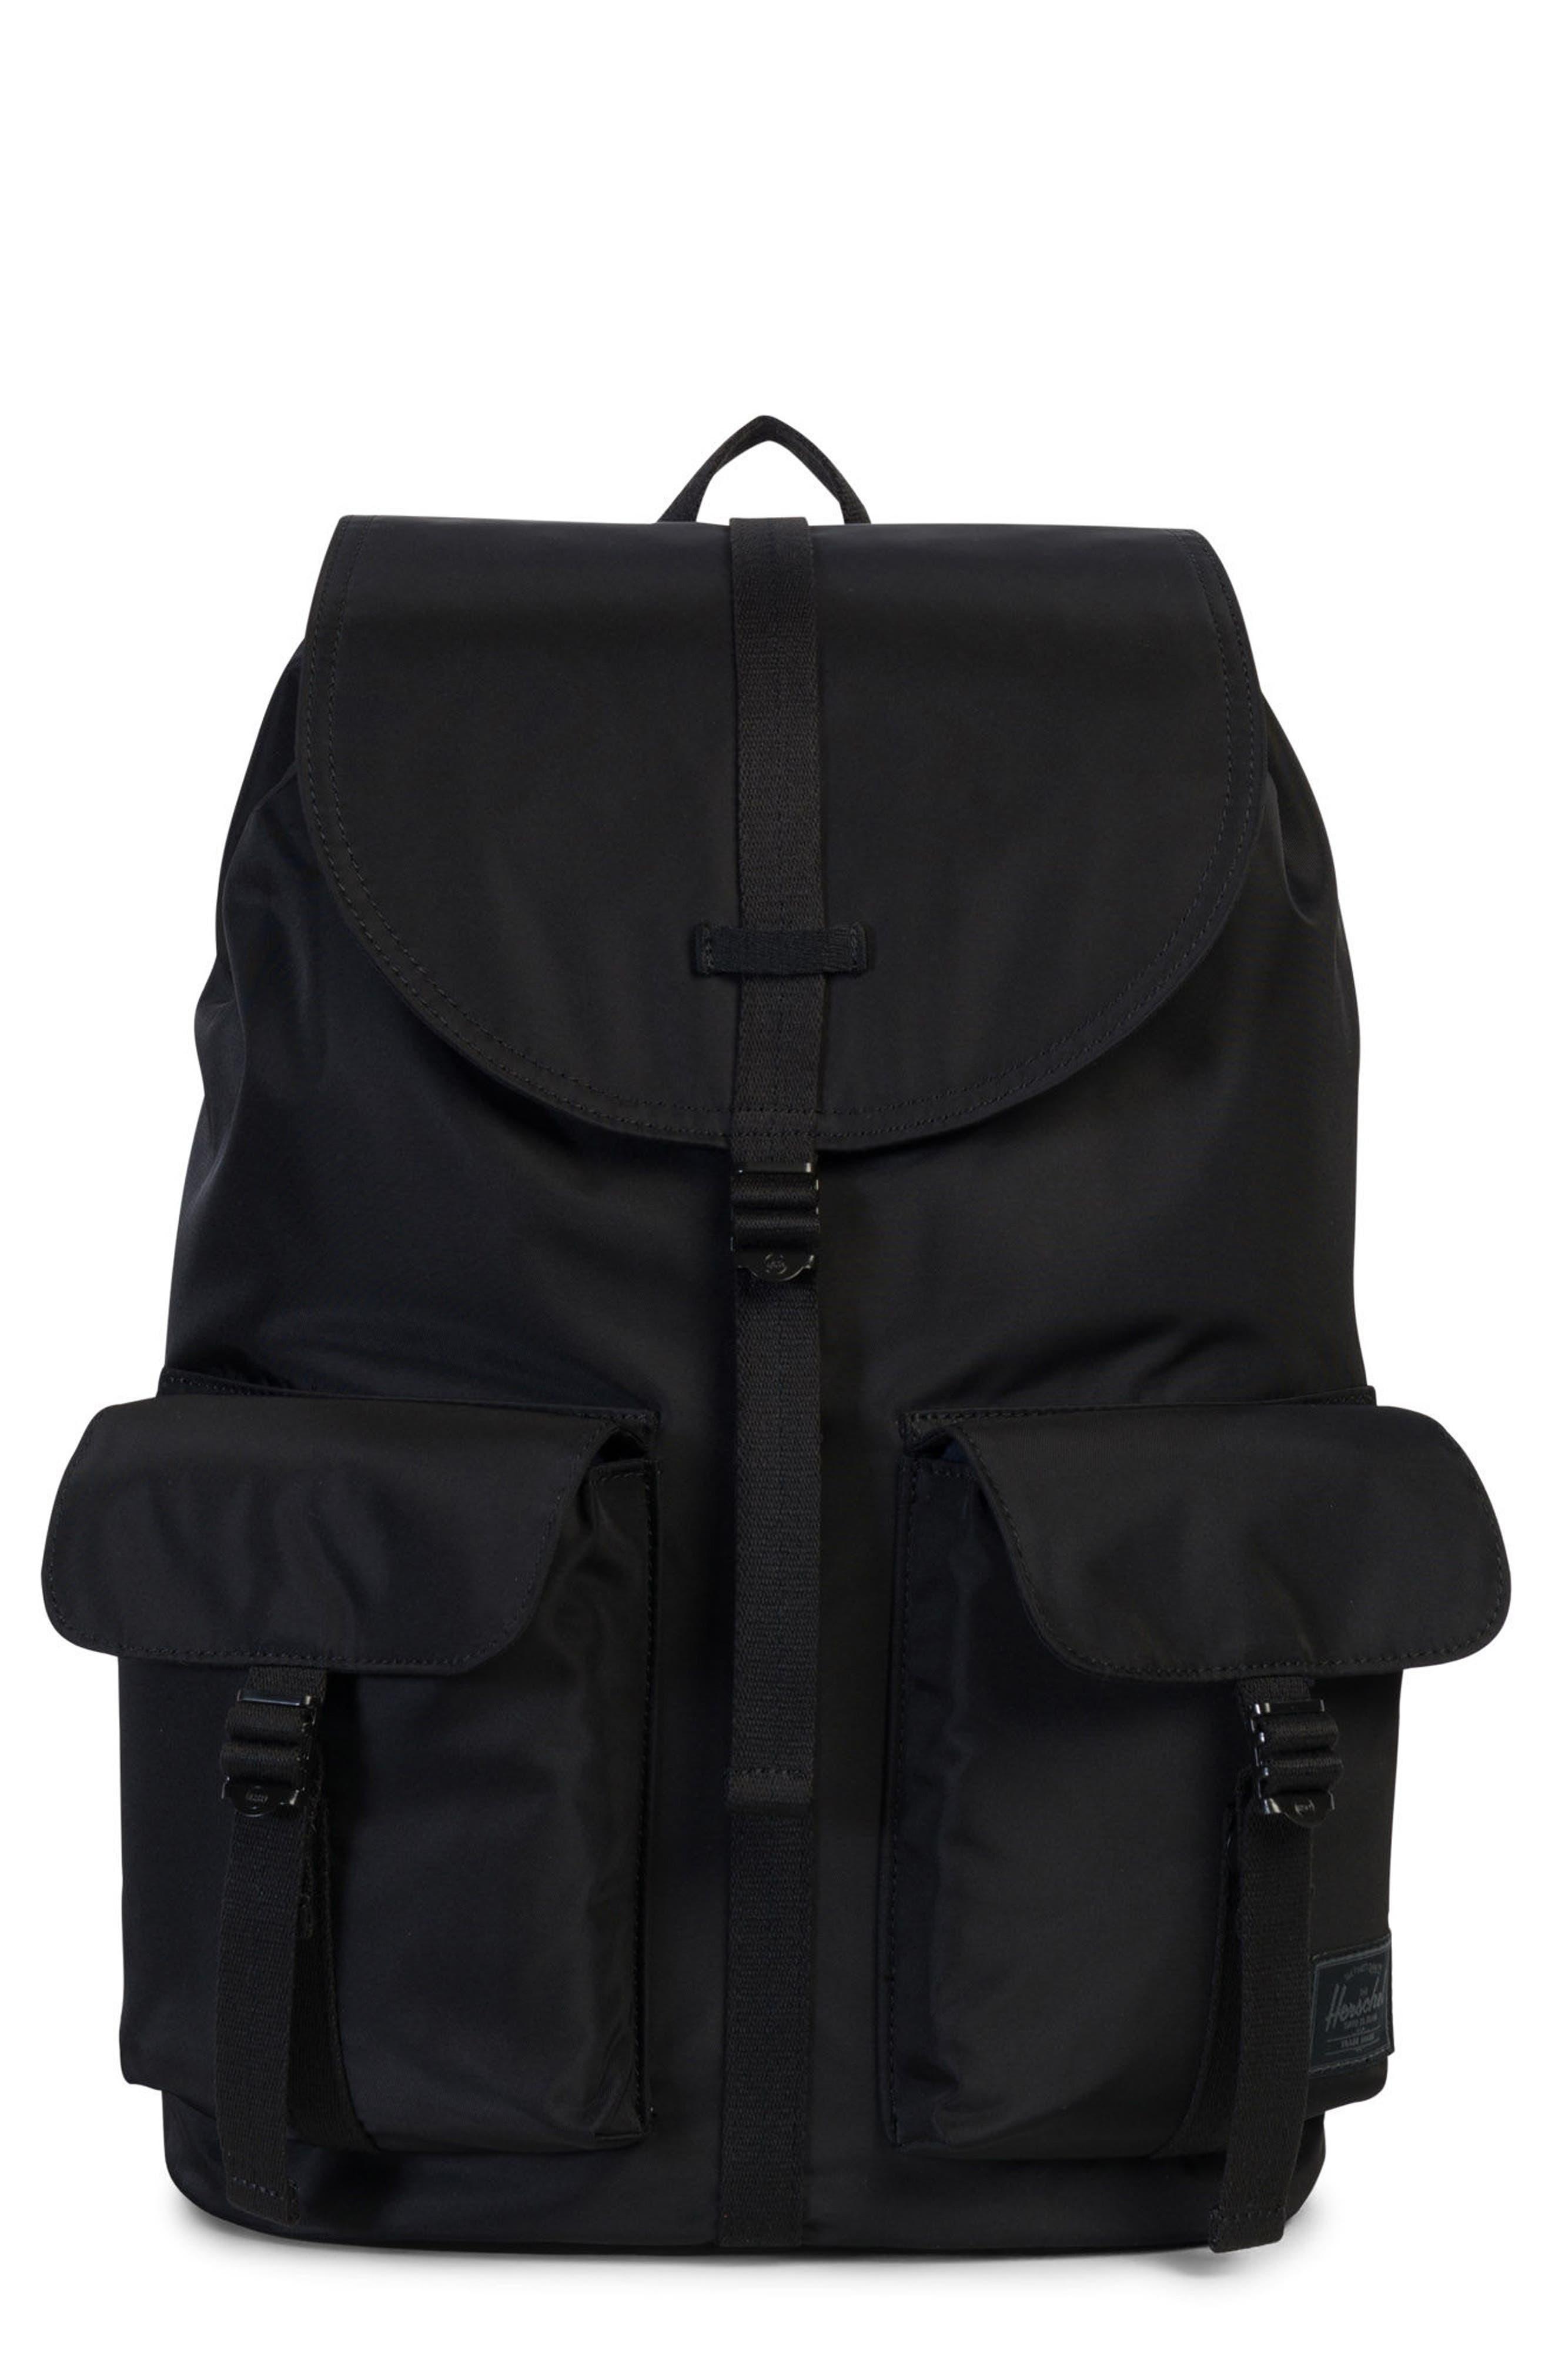 Dawson Surplus Collection Backpack,                             Main thumbnail 1, color,                             Black